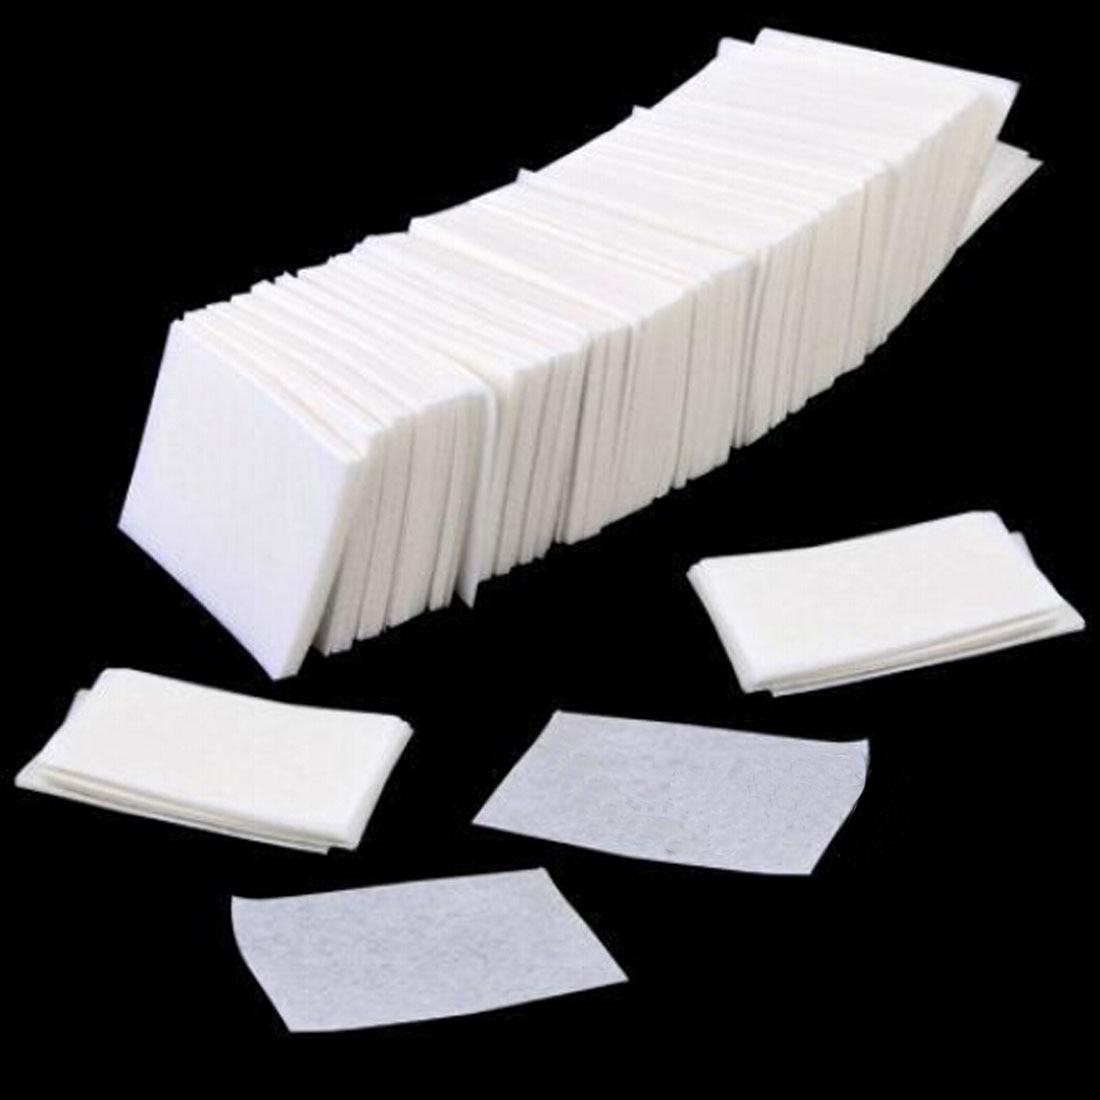 400/800Pcs Lint Wipes Nail Polish Acrylic Gel Remover Towel Paper Cotton Pads Roll Salon Nail Art Cl